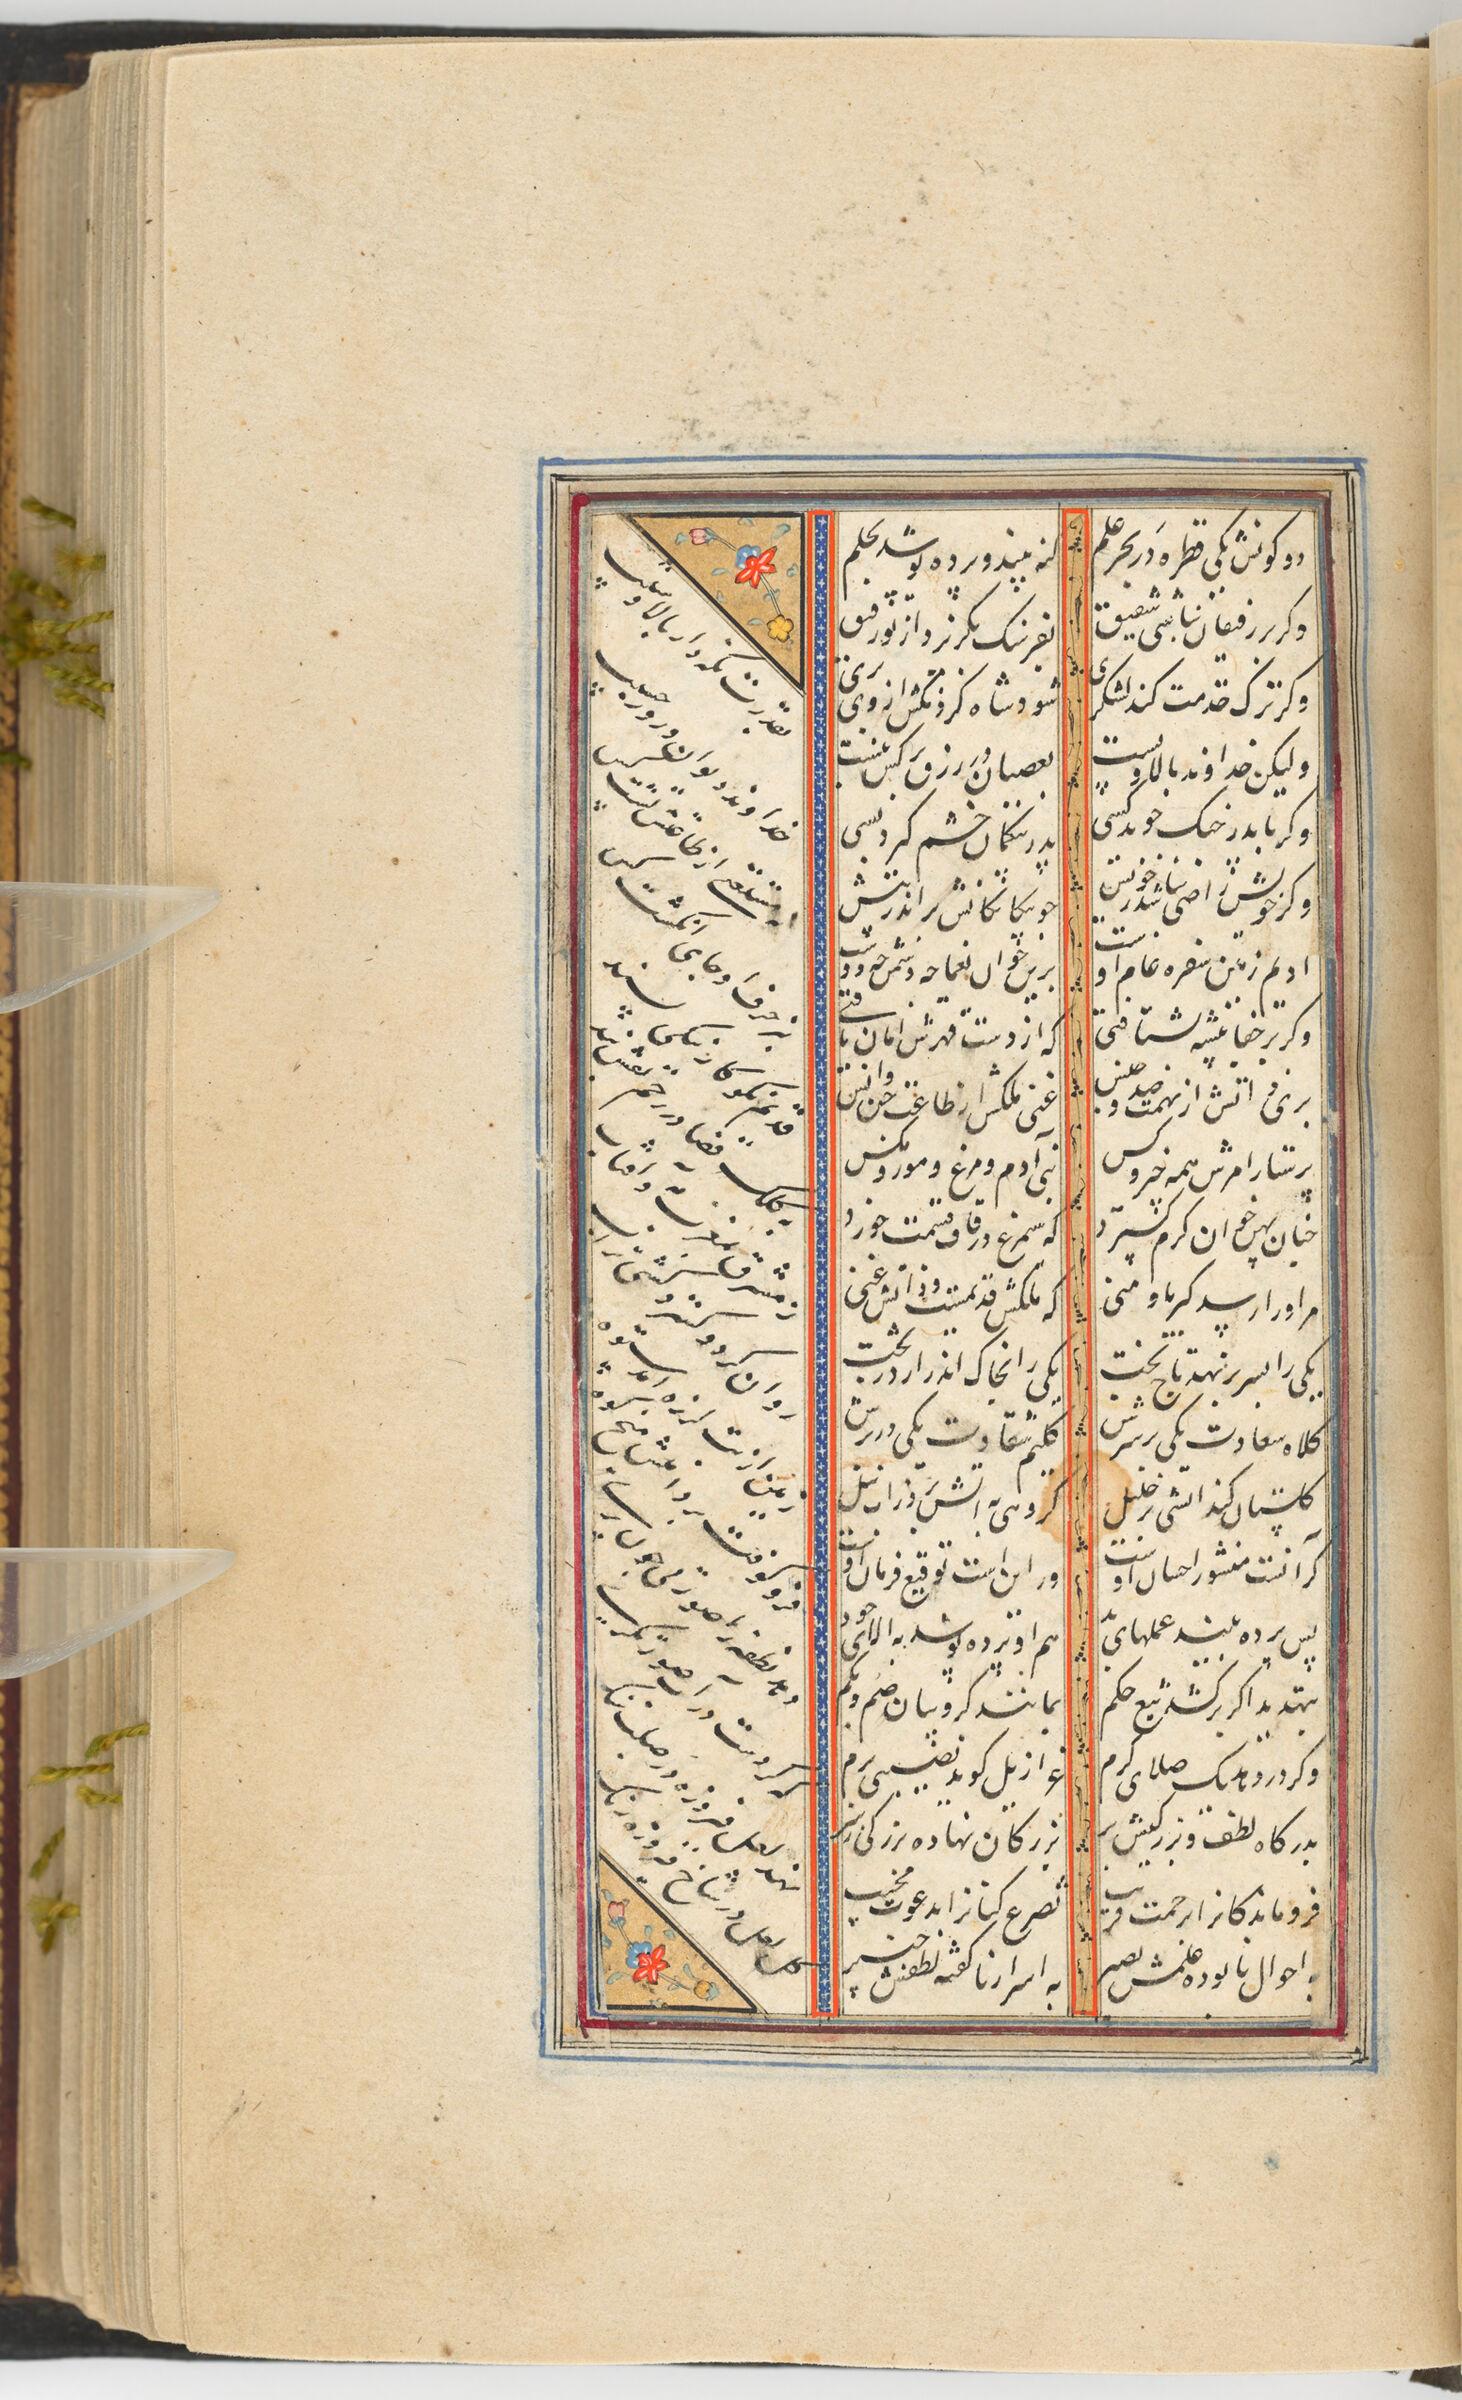 Text Folio (Text Recto; Text Verso Of Folio 80), From A Manuscript Of The Kulliyat Of Sa'di